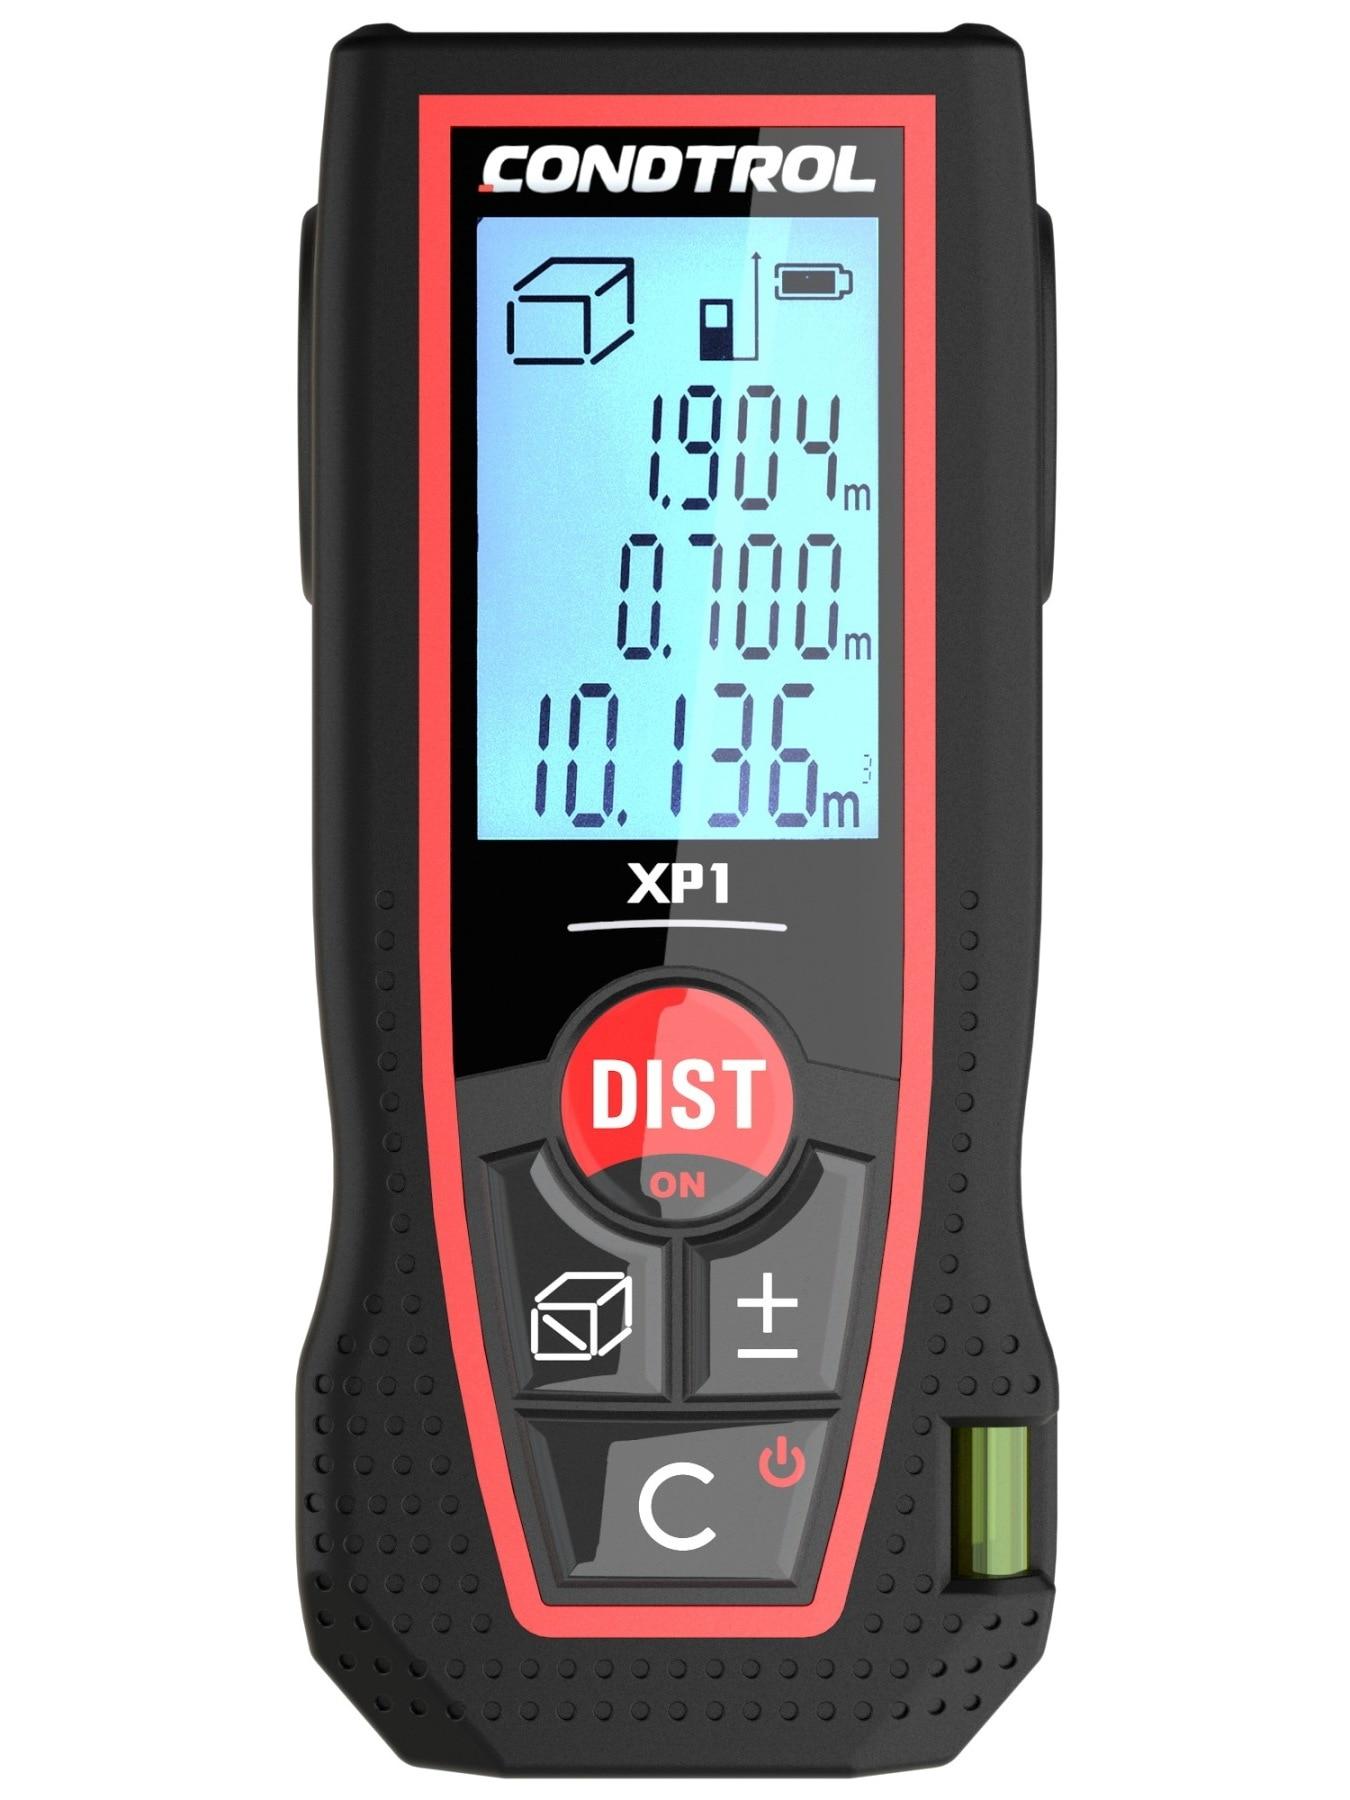 Entfernungsmesser CONDTROL XP1